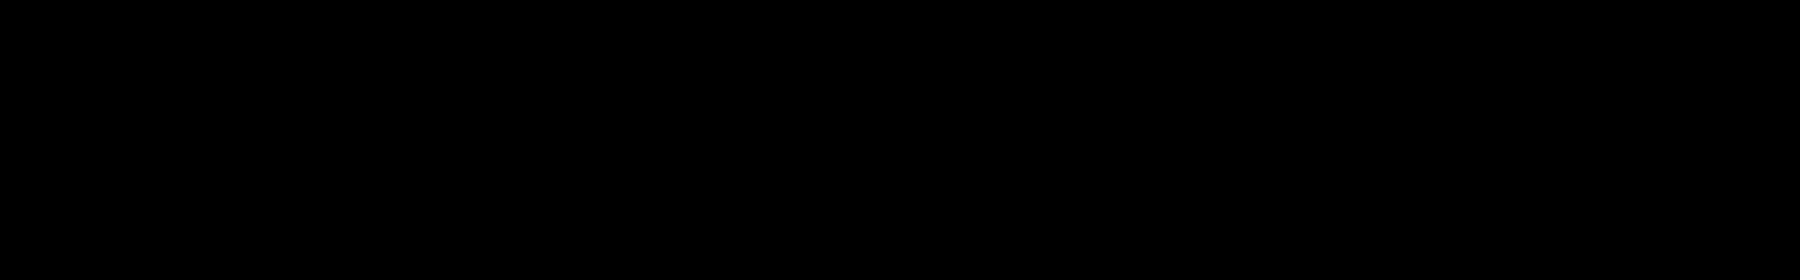 FM8 Arpeggiator Sounds audio waveform